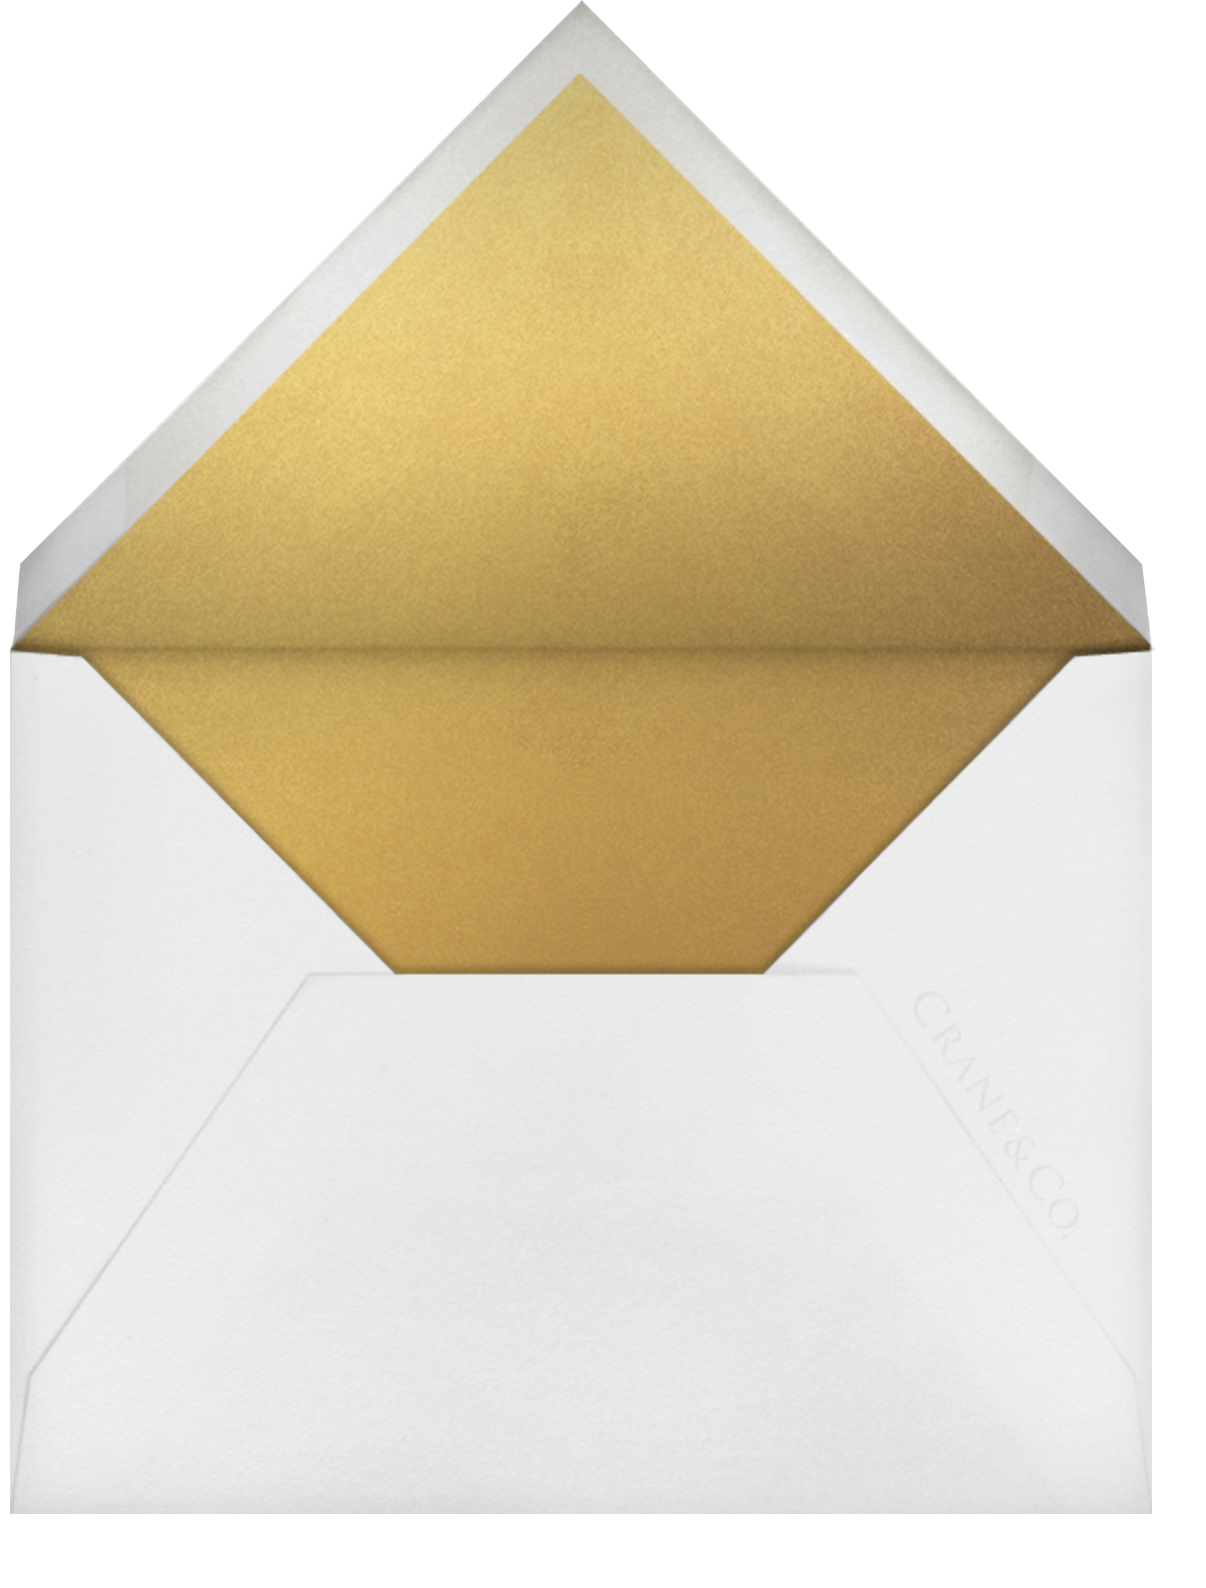 Fieldstone - Medium Gold - Paperless Post - Envelope